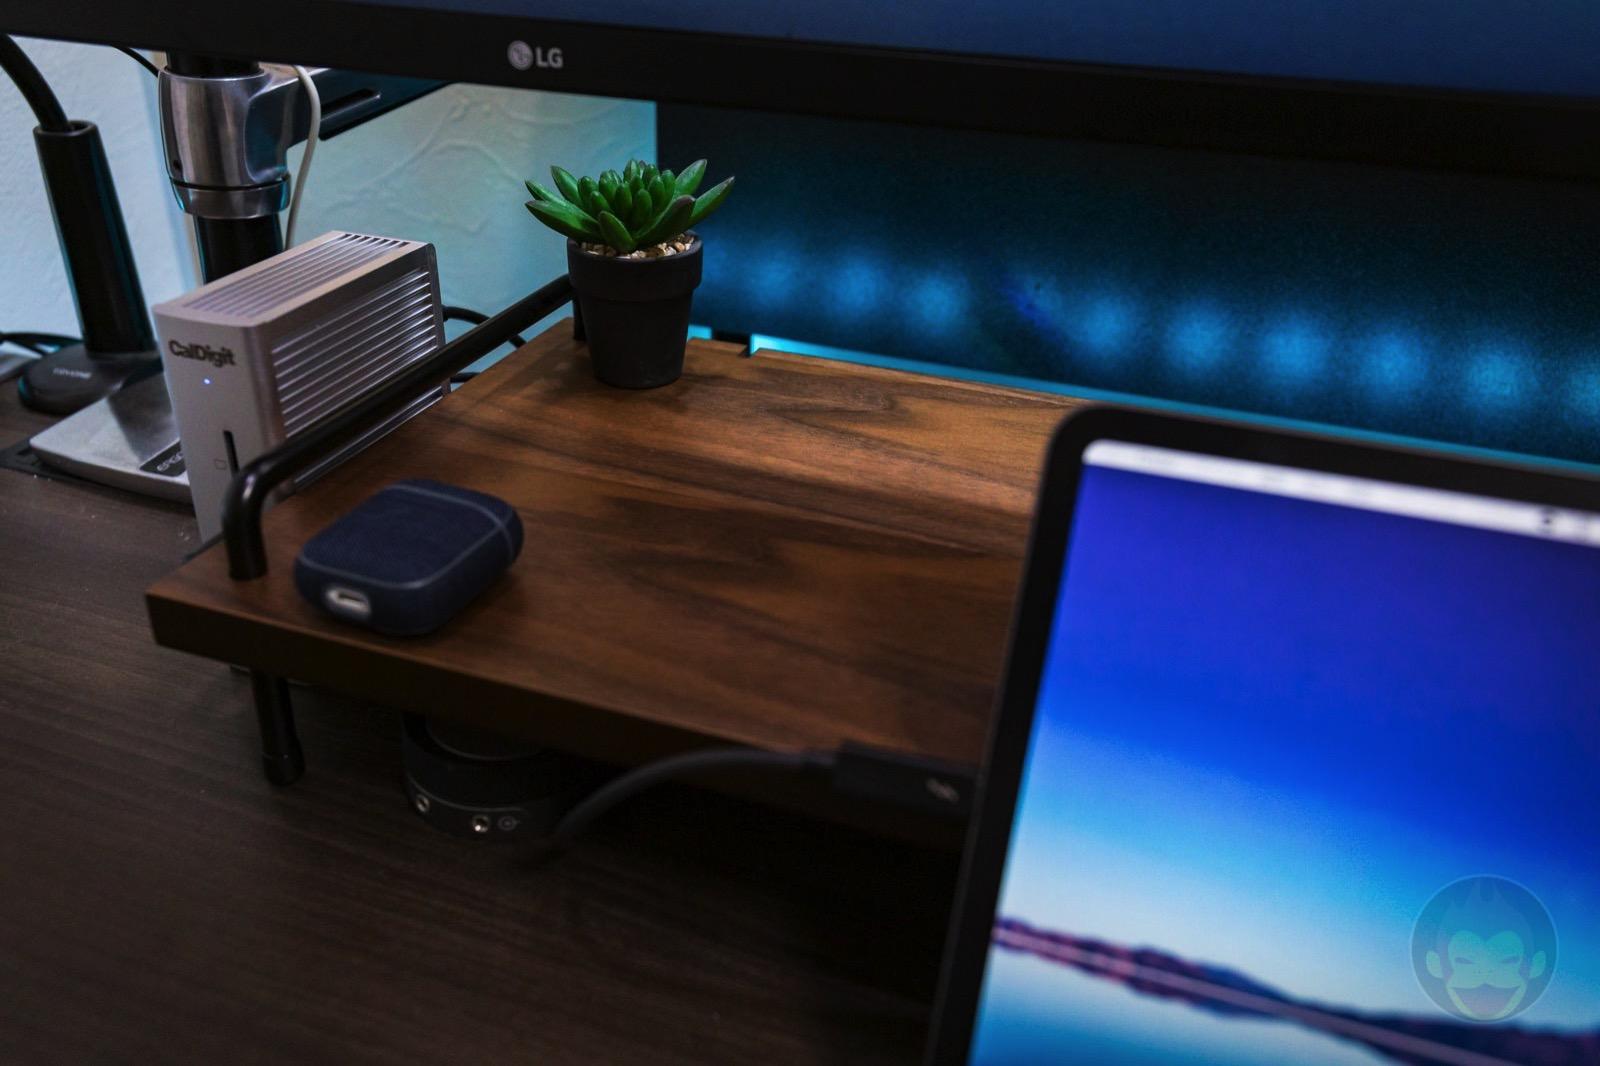 GoriMe-Workspace-2020-January-28.jpg